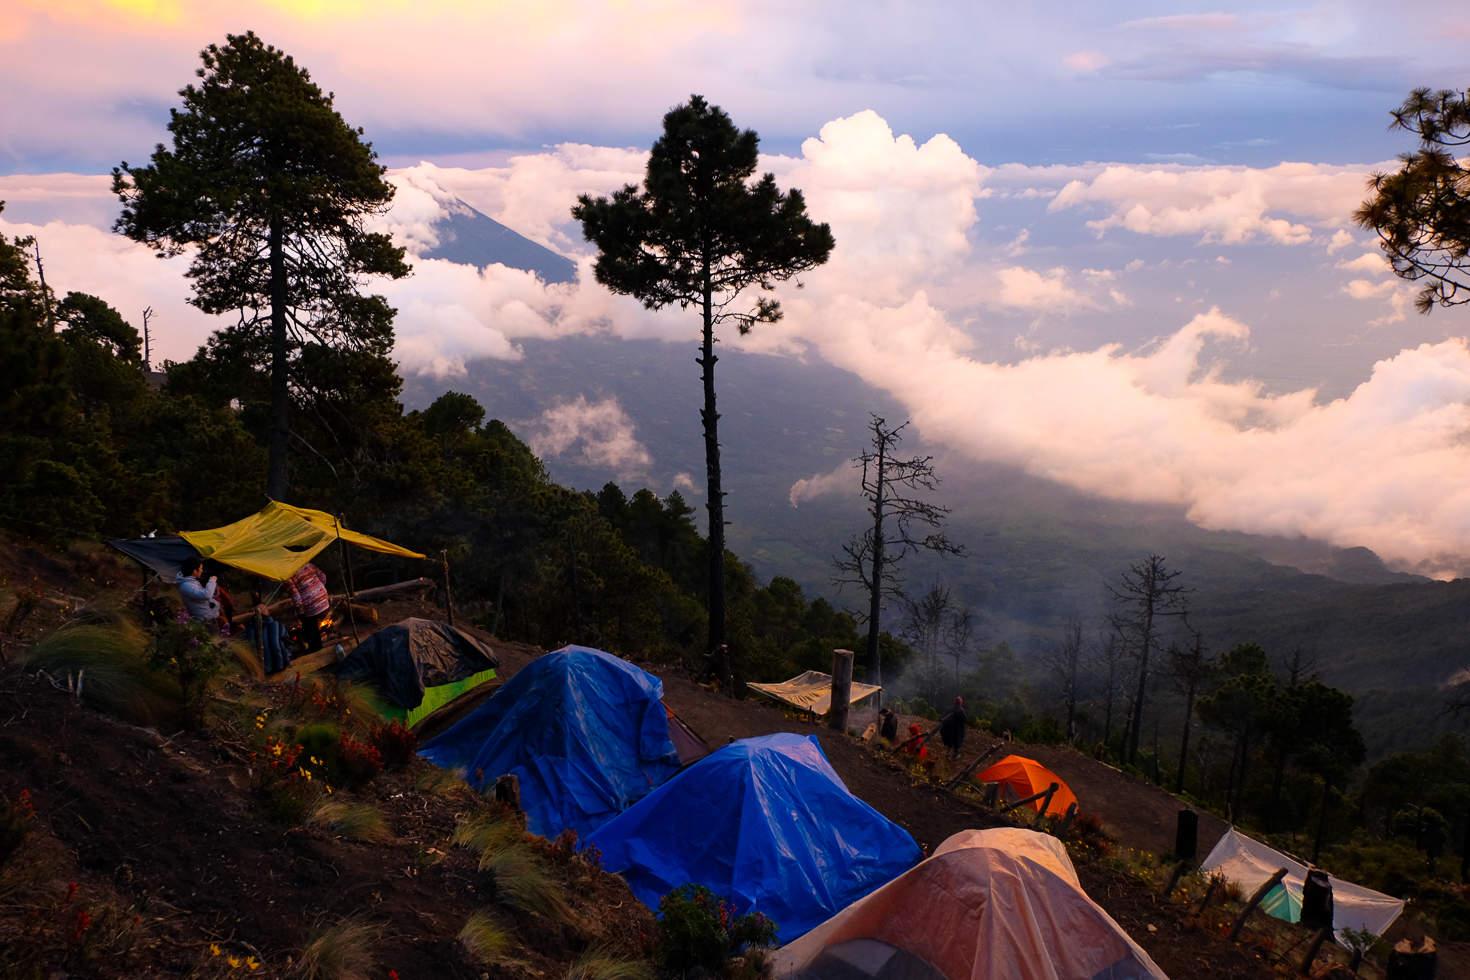 Gilmur's Campsite on Acatenango Volcano